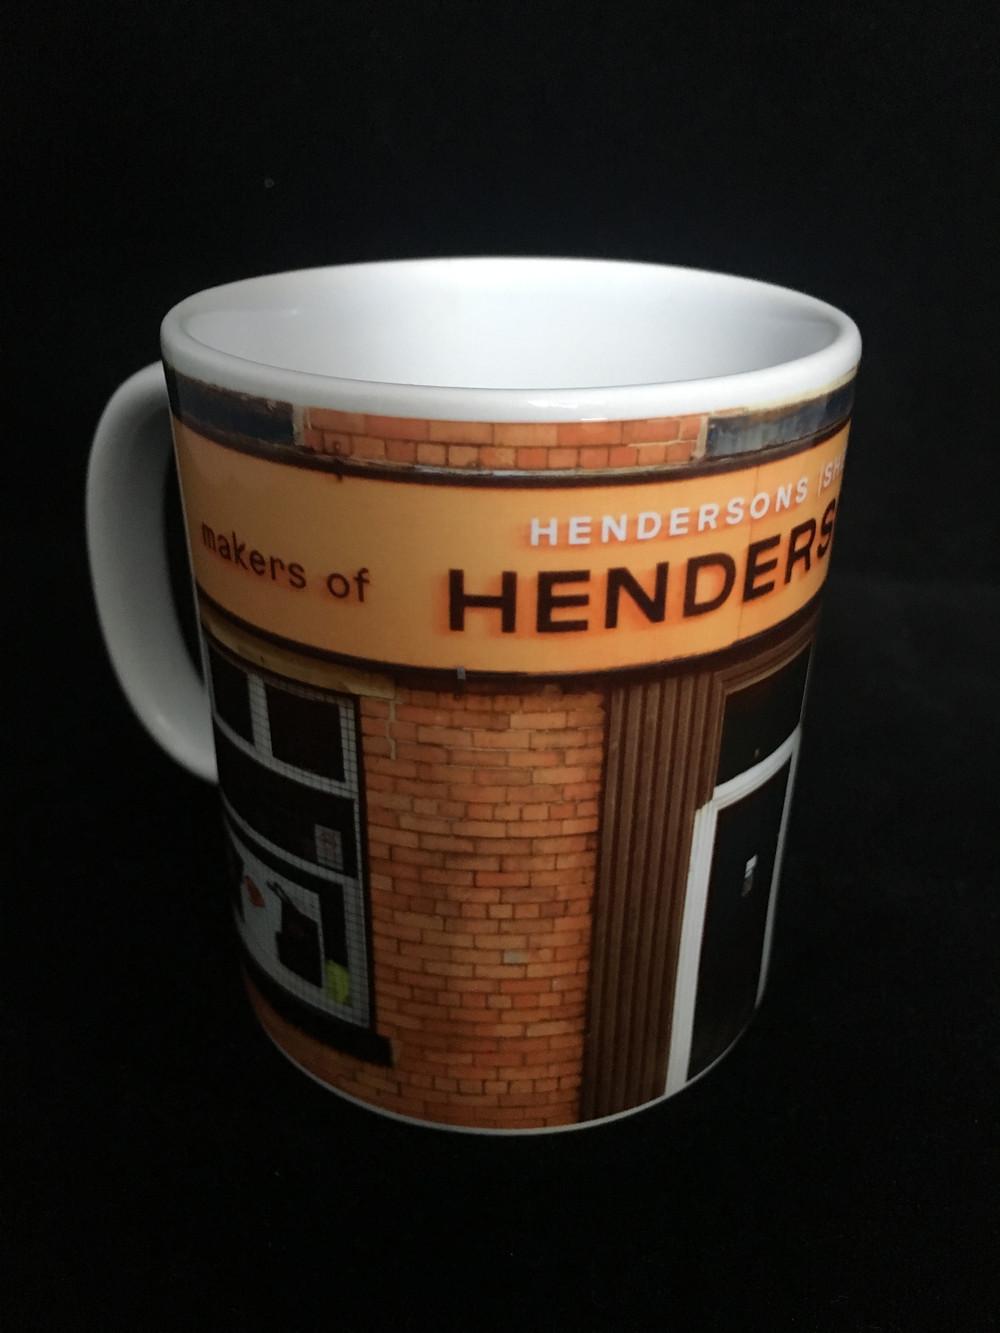 Henderson's Mug